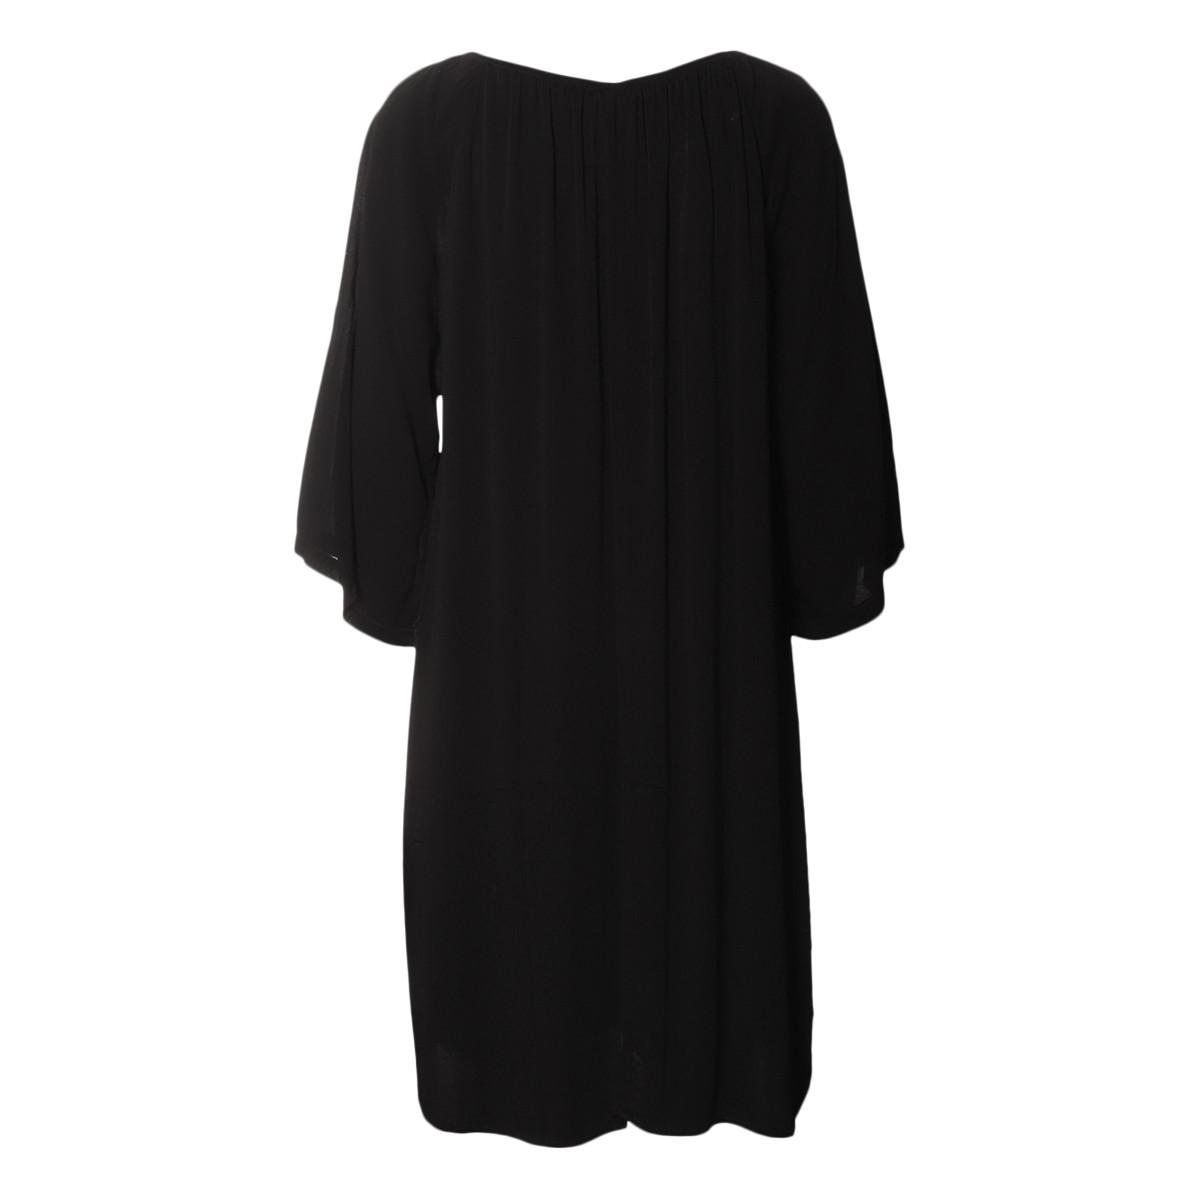 Lily kjole sort Project AJ117 | Rikke Solberg